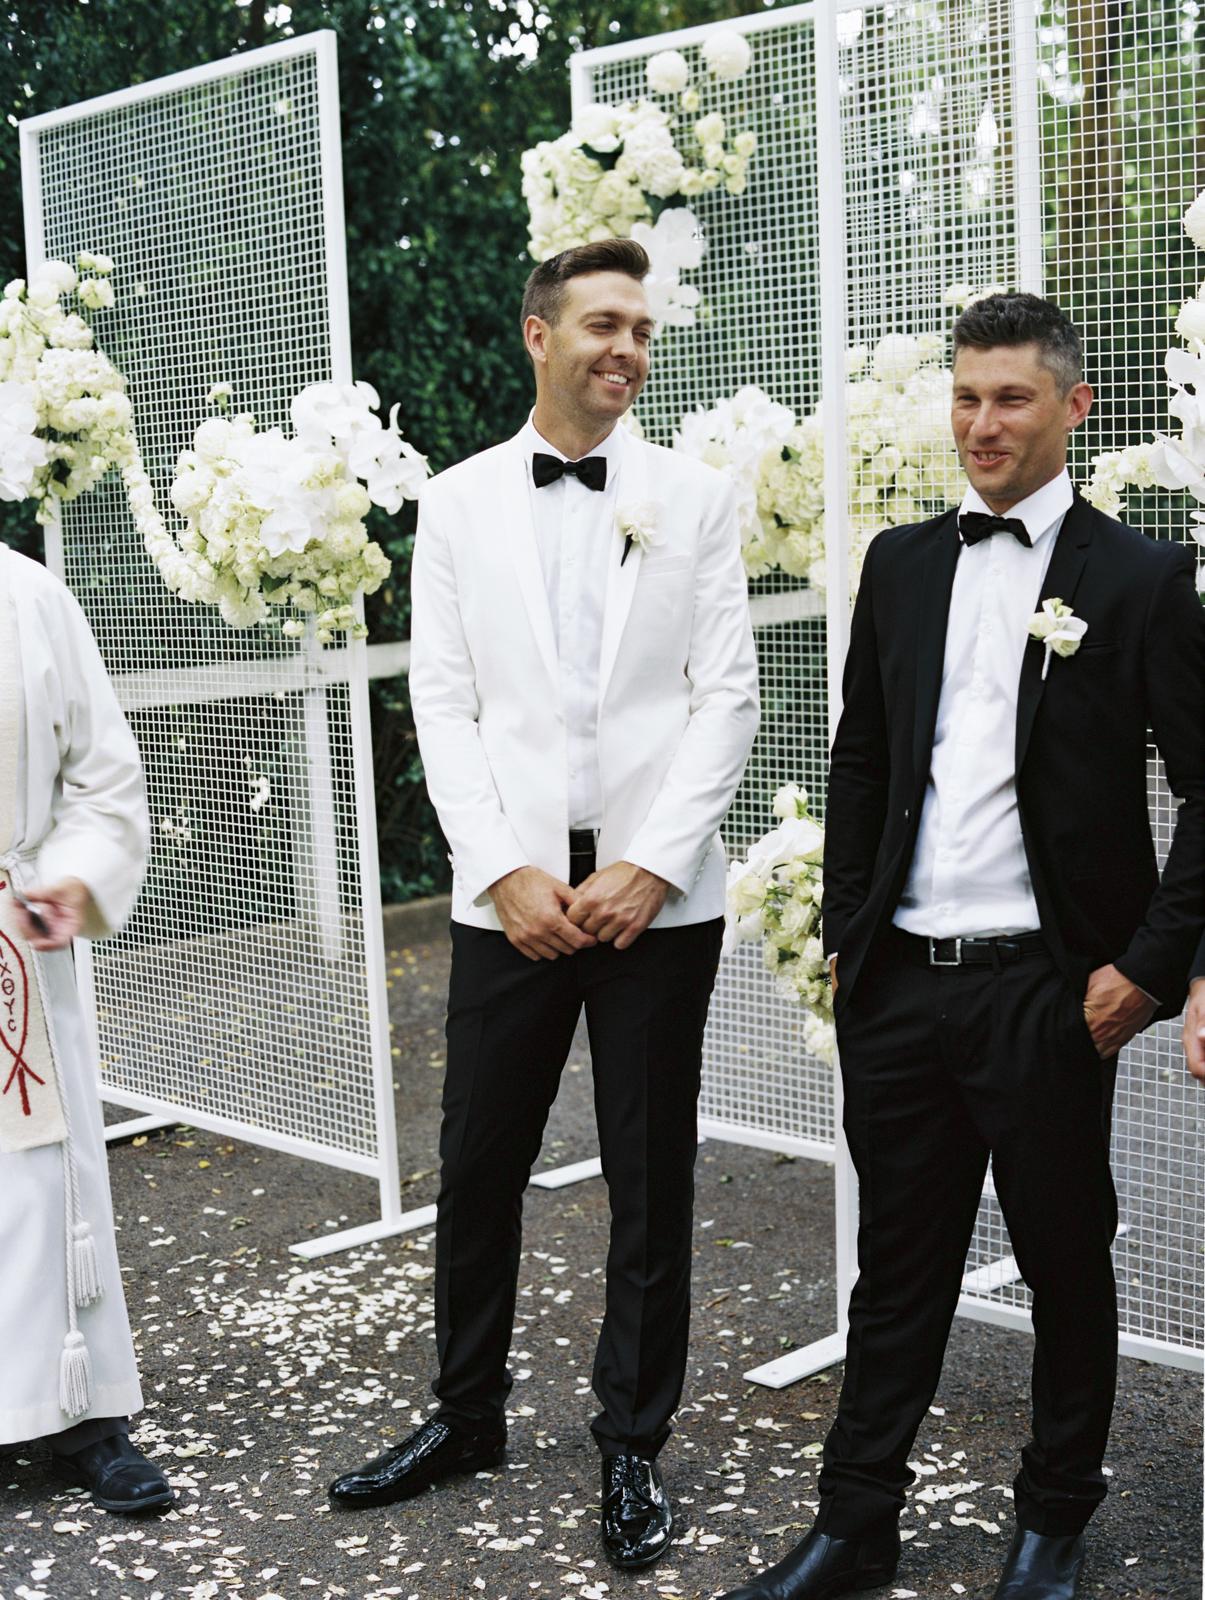 BAROSSA-VALLEY-WEDDING-PHOTOGRAPHER-0026.jpg